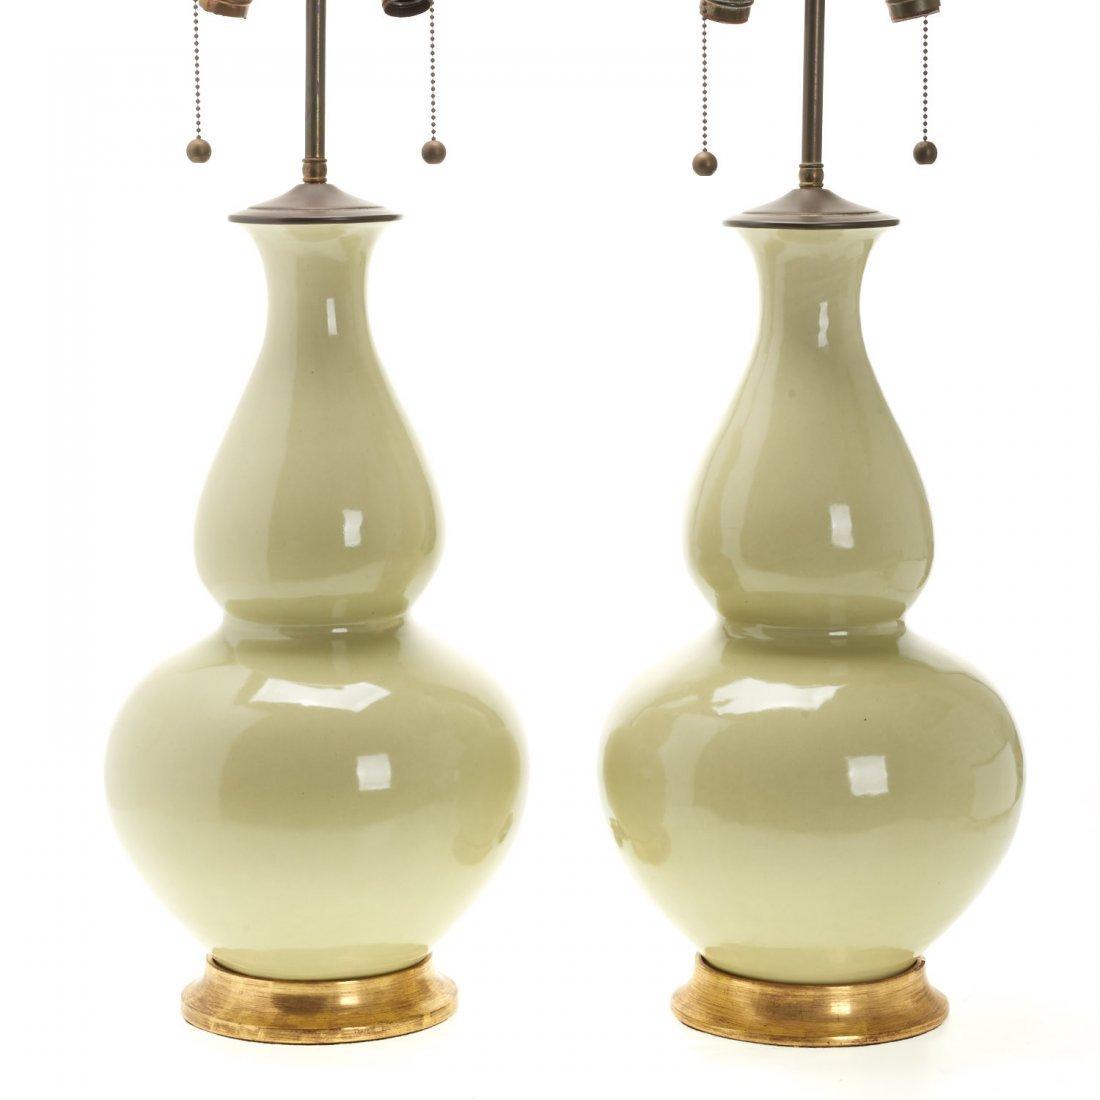 Pair Christopher Spitzmiller green ceramic lamps